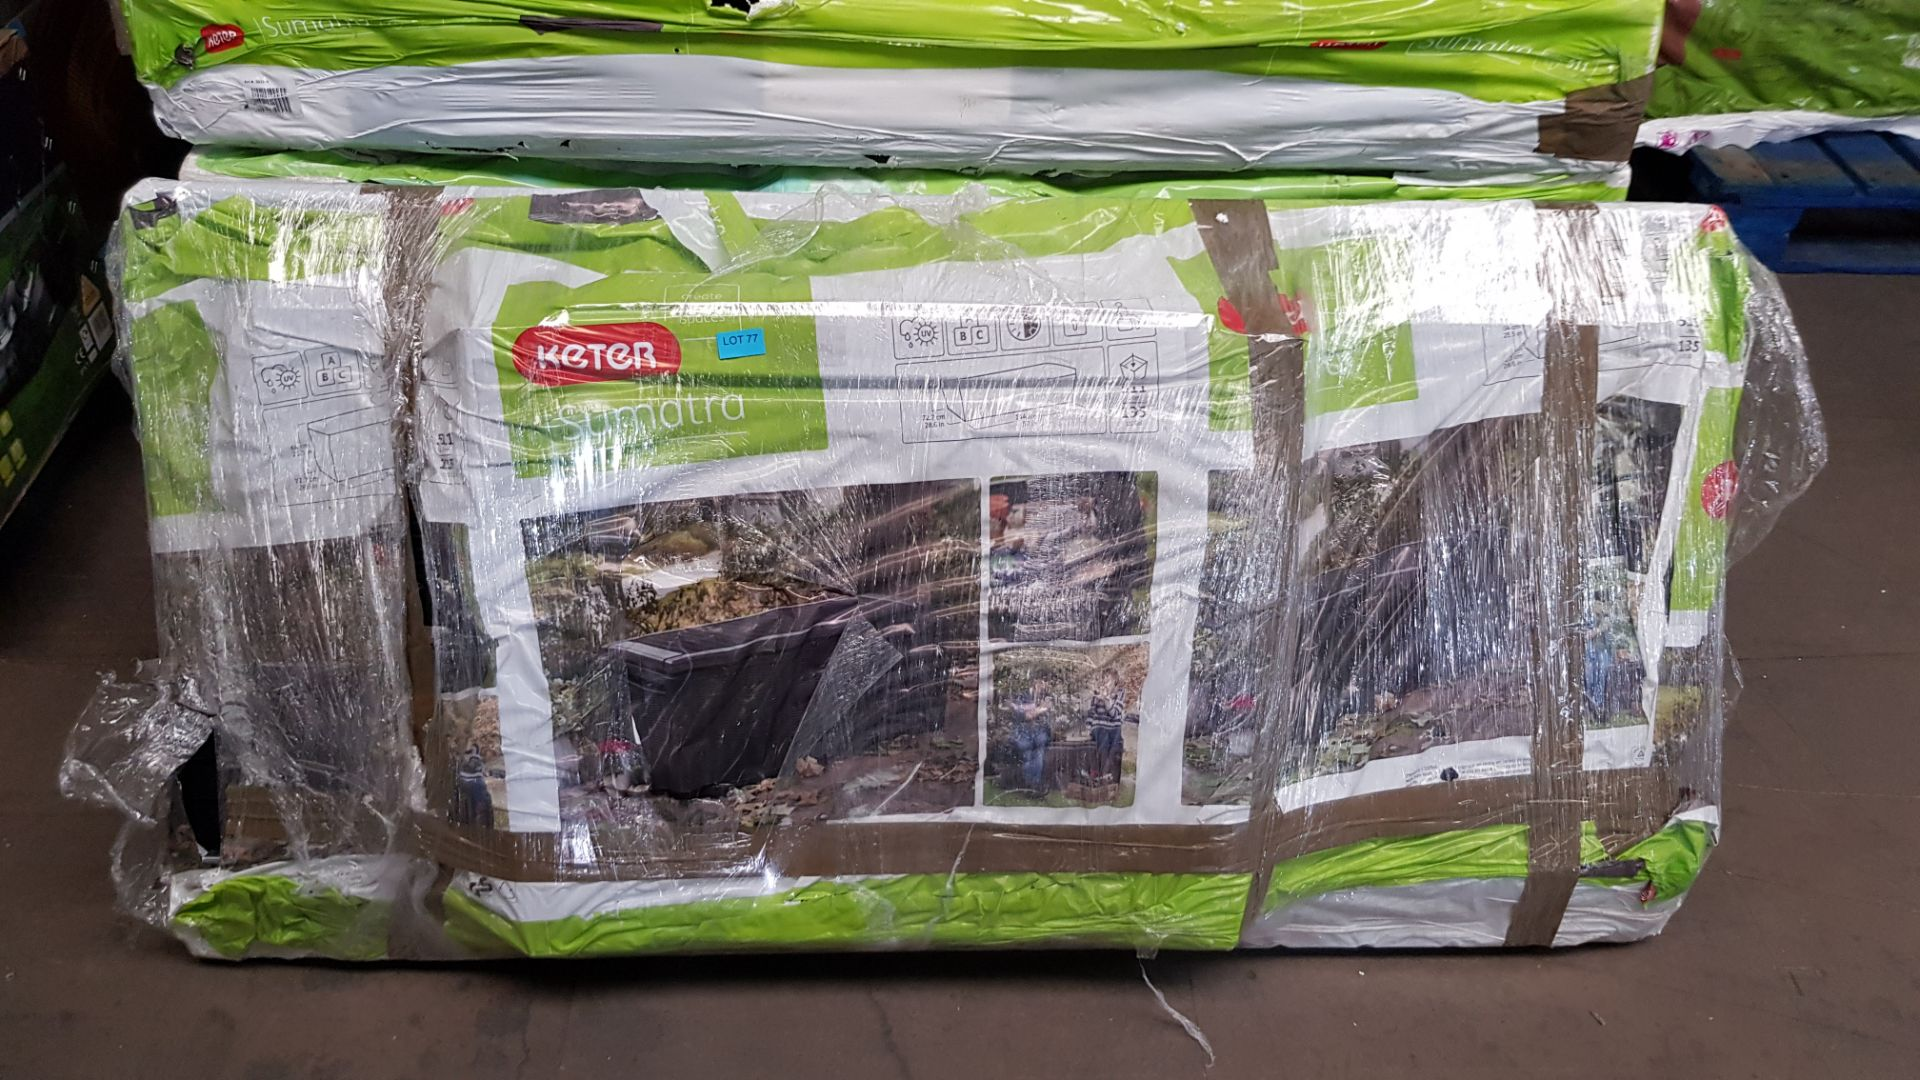 (P4) 1x Keter Sumatra 511L. RRP £149.95. (H64x W145x D73cm) - Image 3 of 3